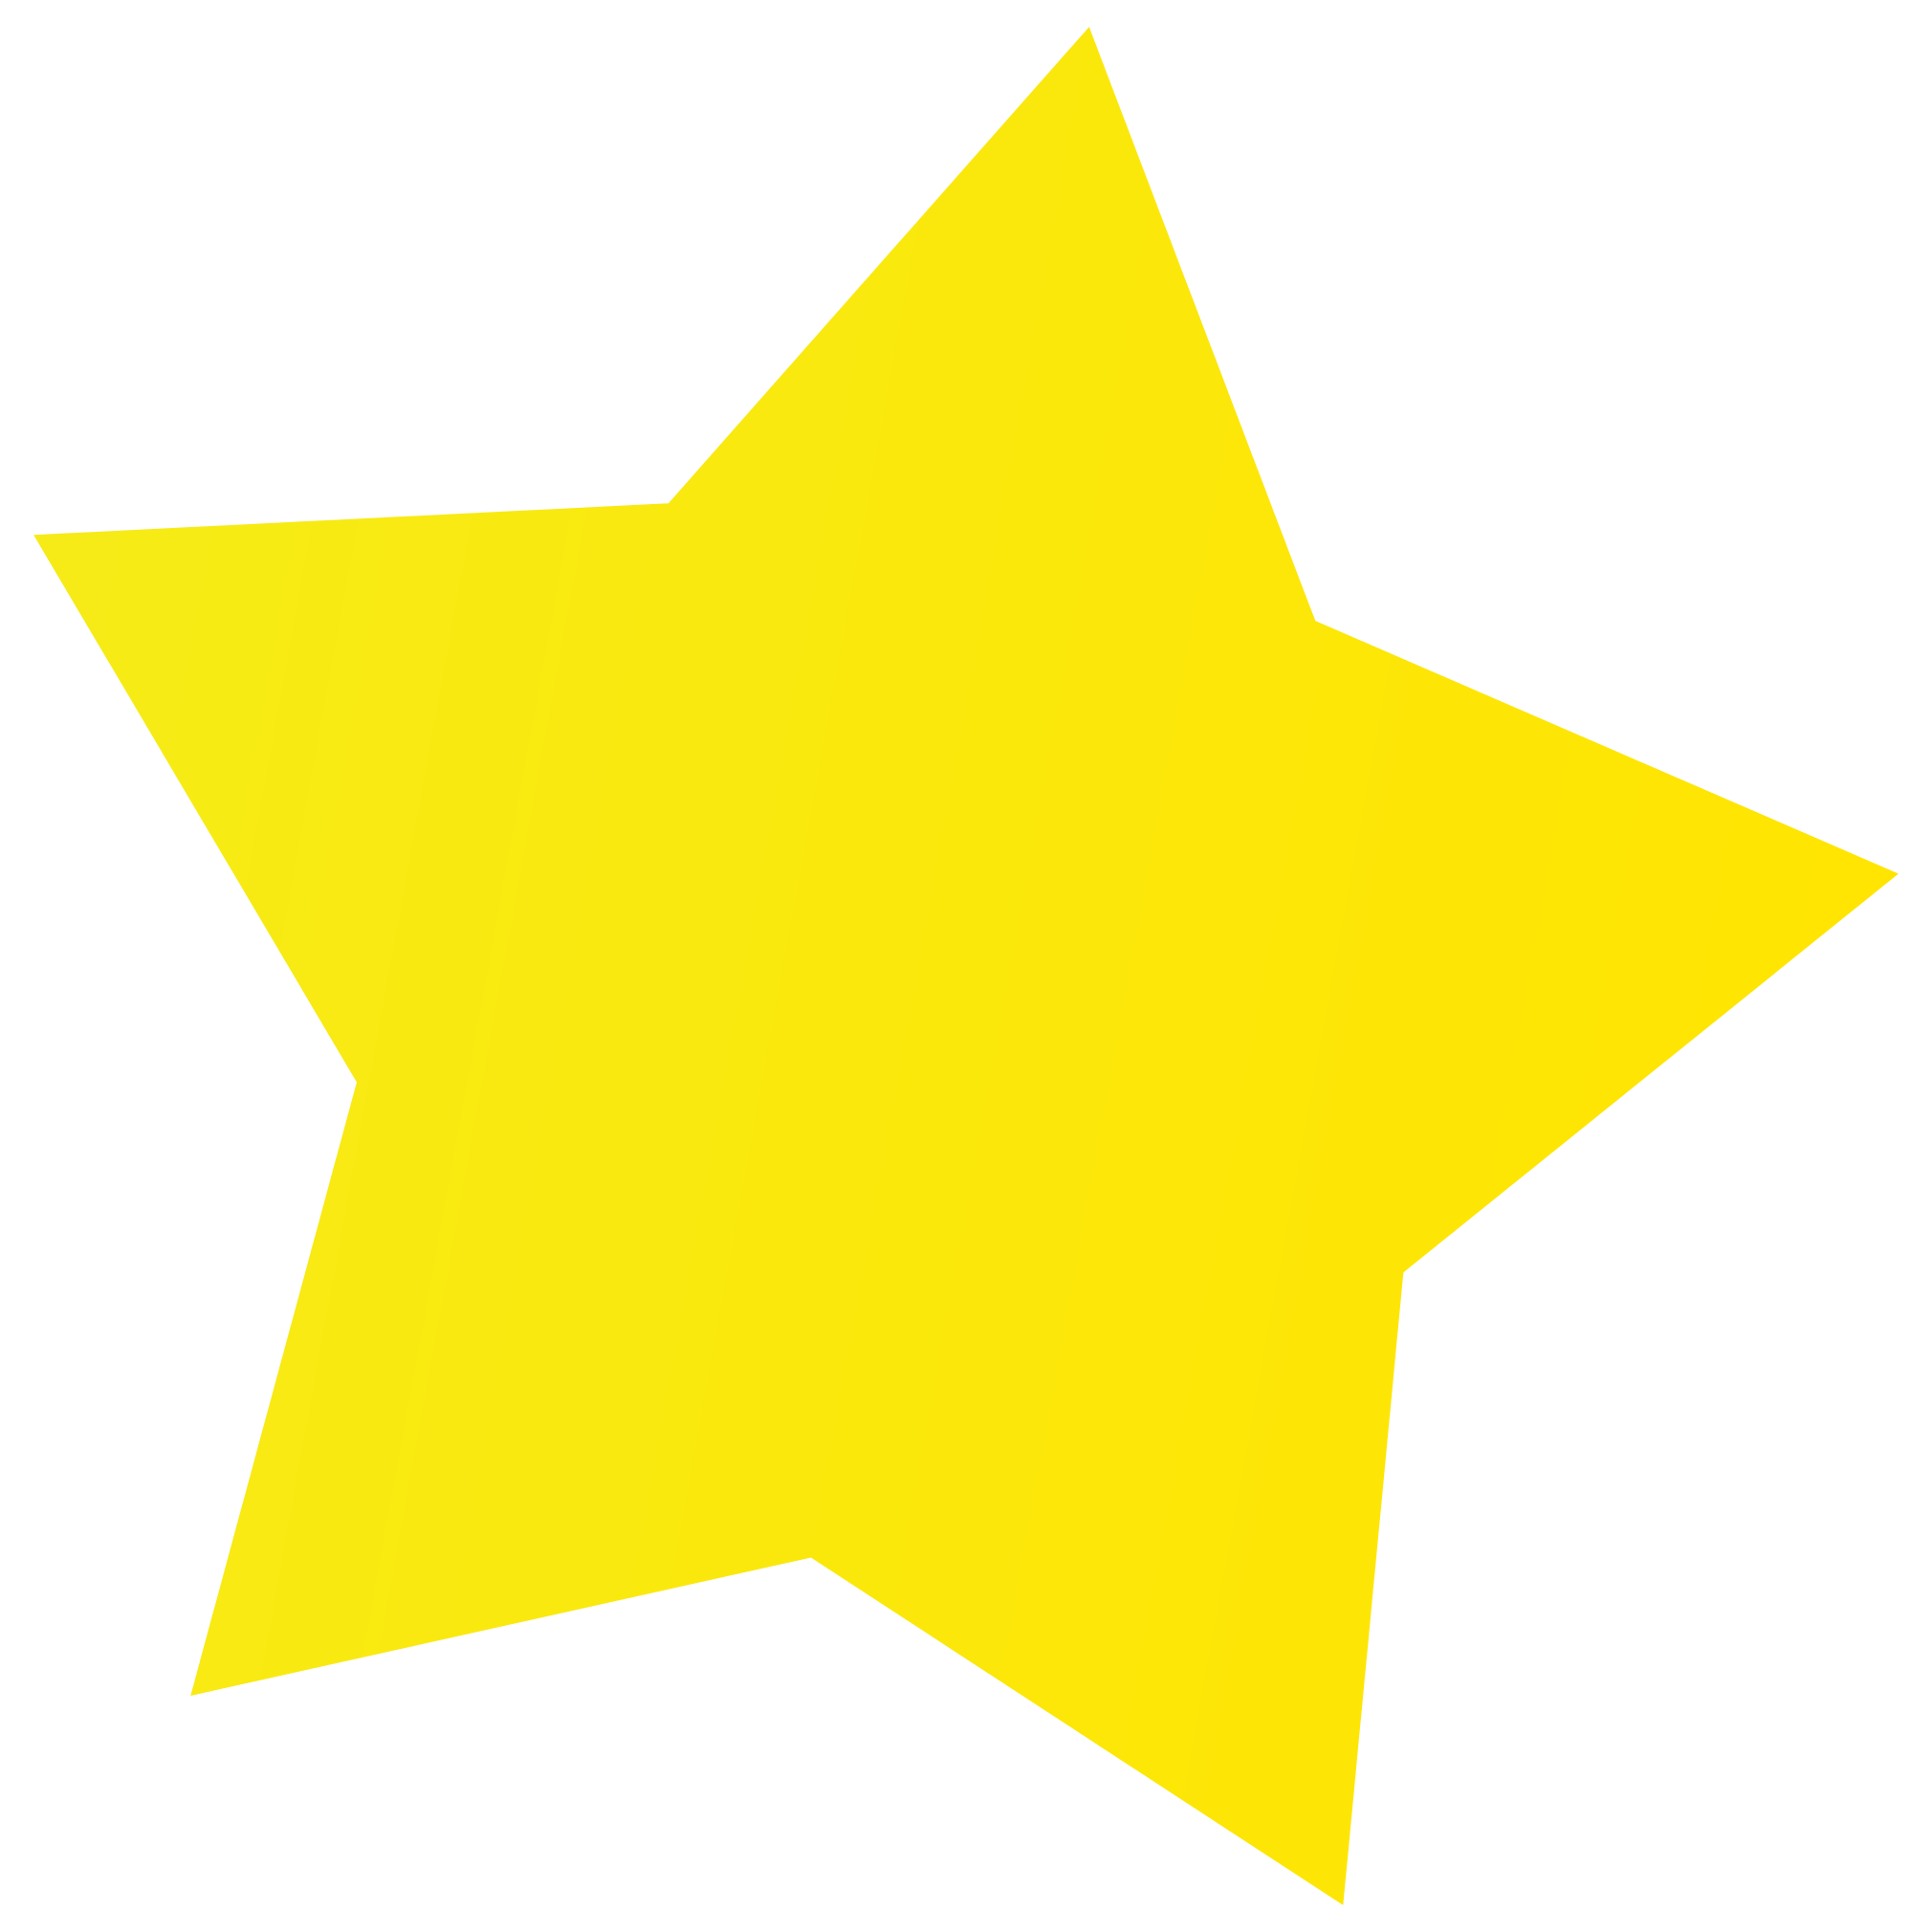 Galaxy clipart realistic star. Clip art png best